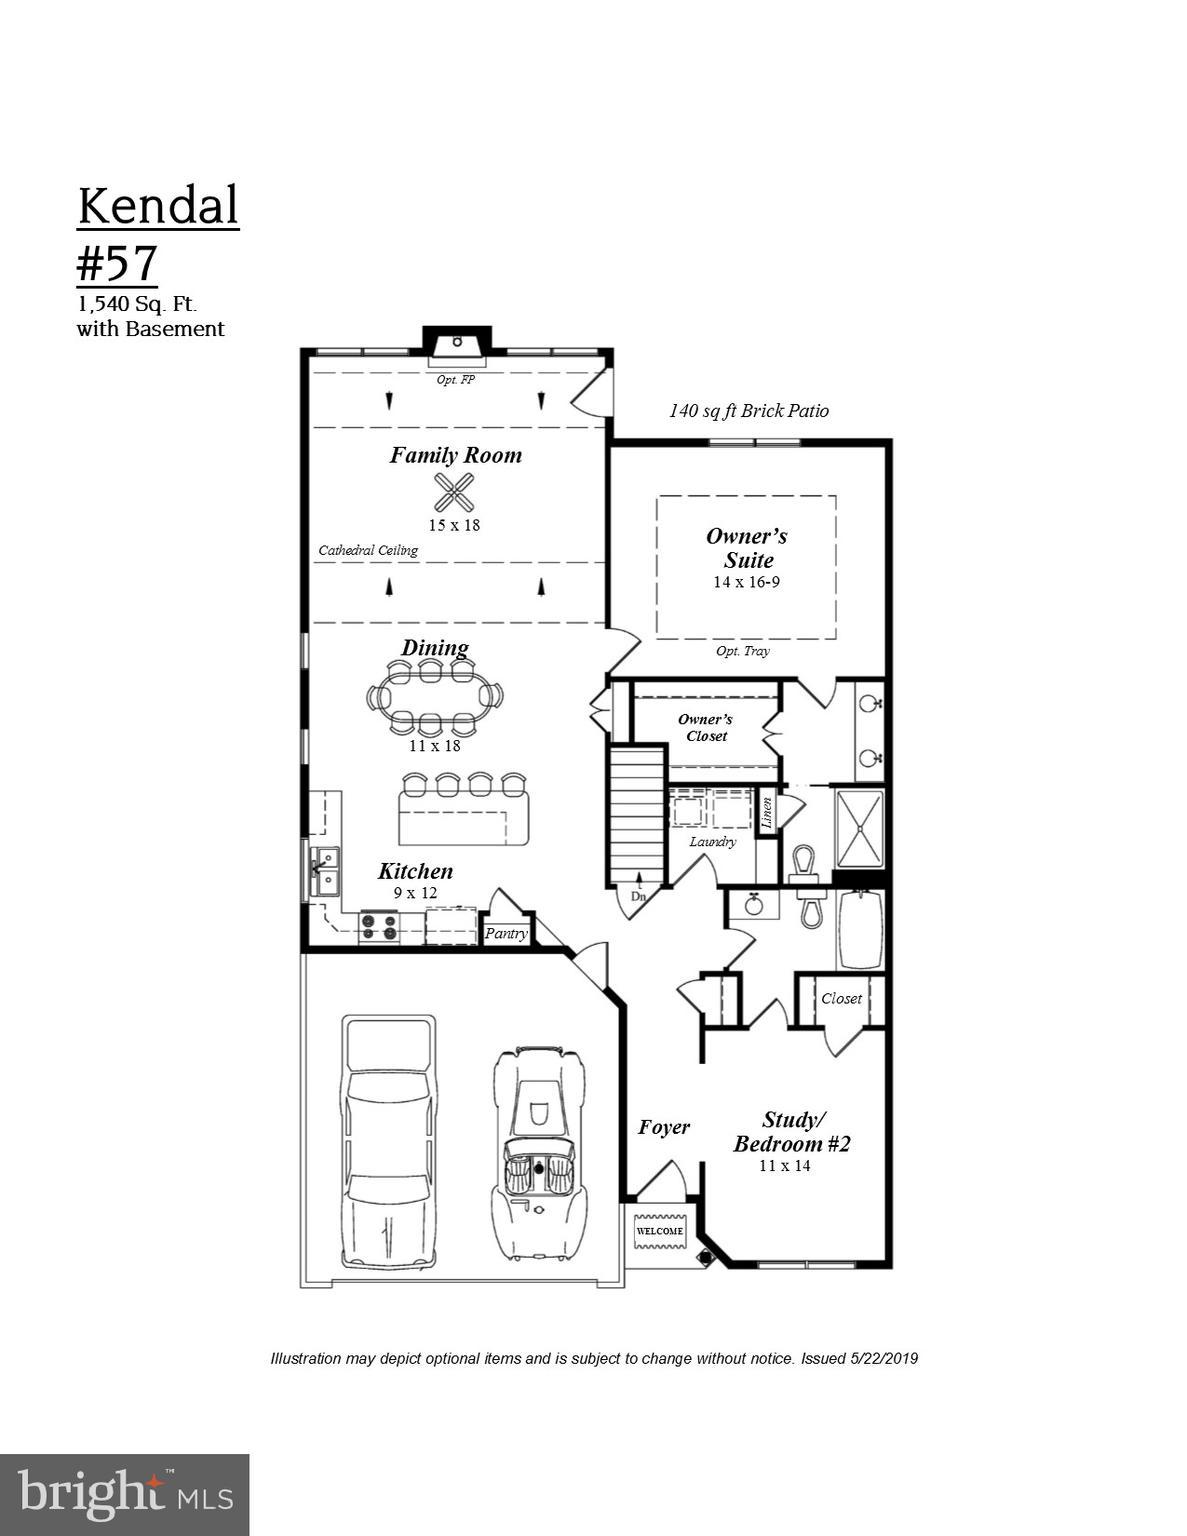 Brochure plan.  Kendal #3 is an interior home.